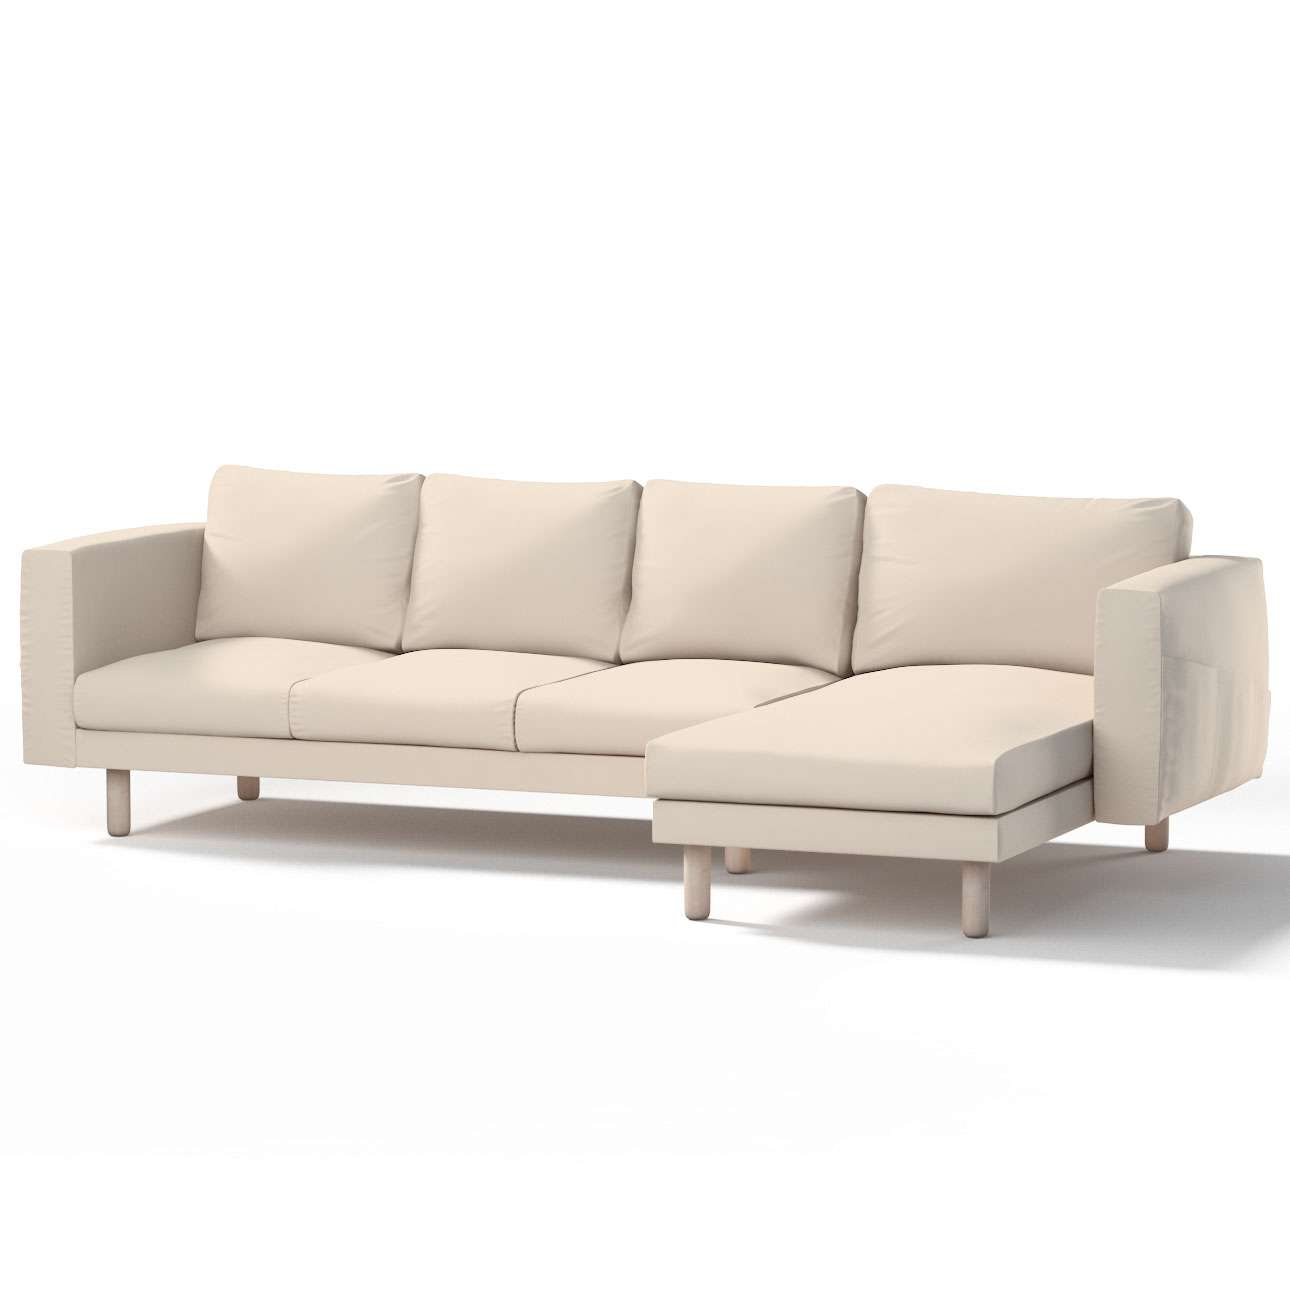 norsborg bezug f r 4 sitzer sofa mit recamiere naturwei. Black Bedroom Furniture Sets. Home Design Ideas